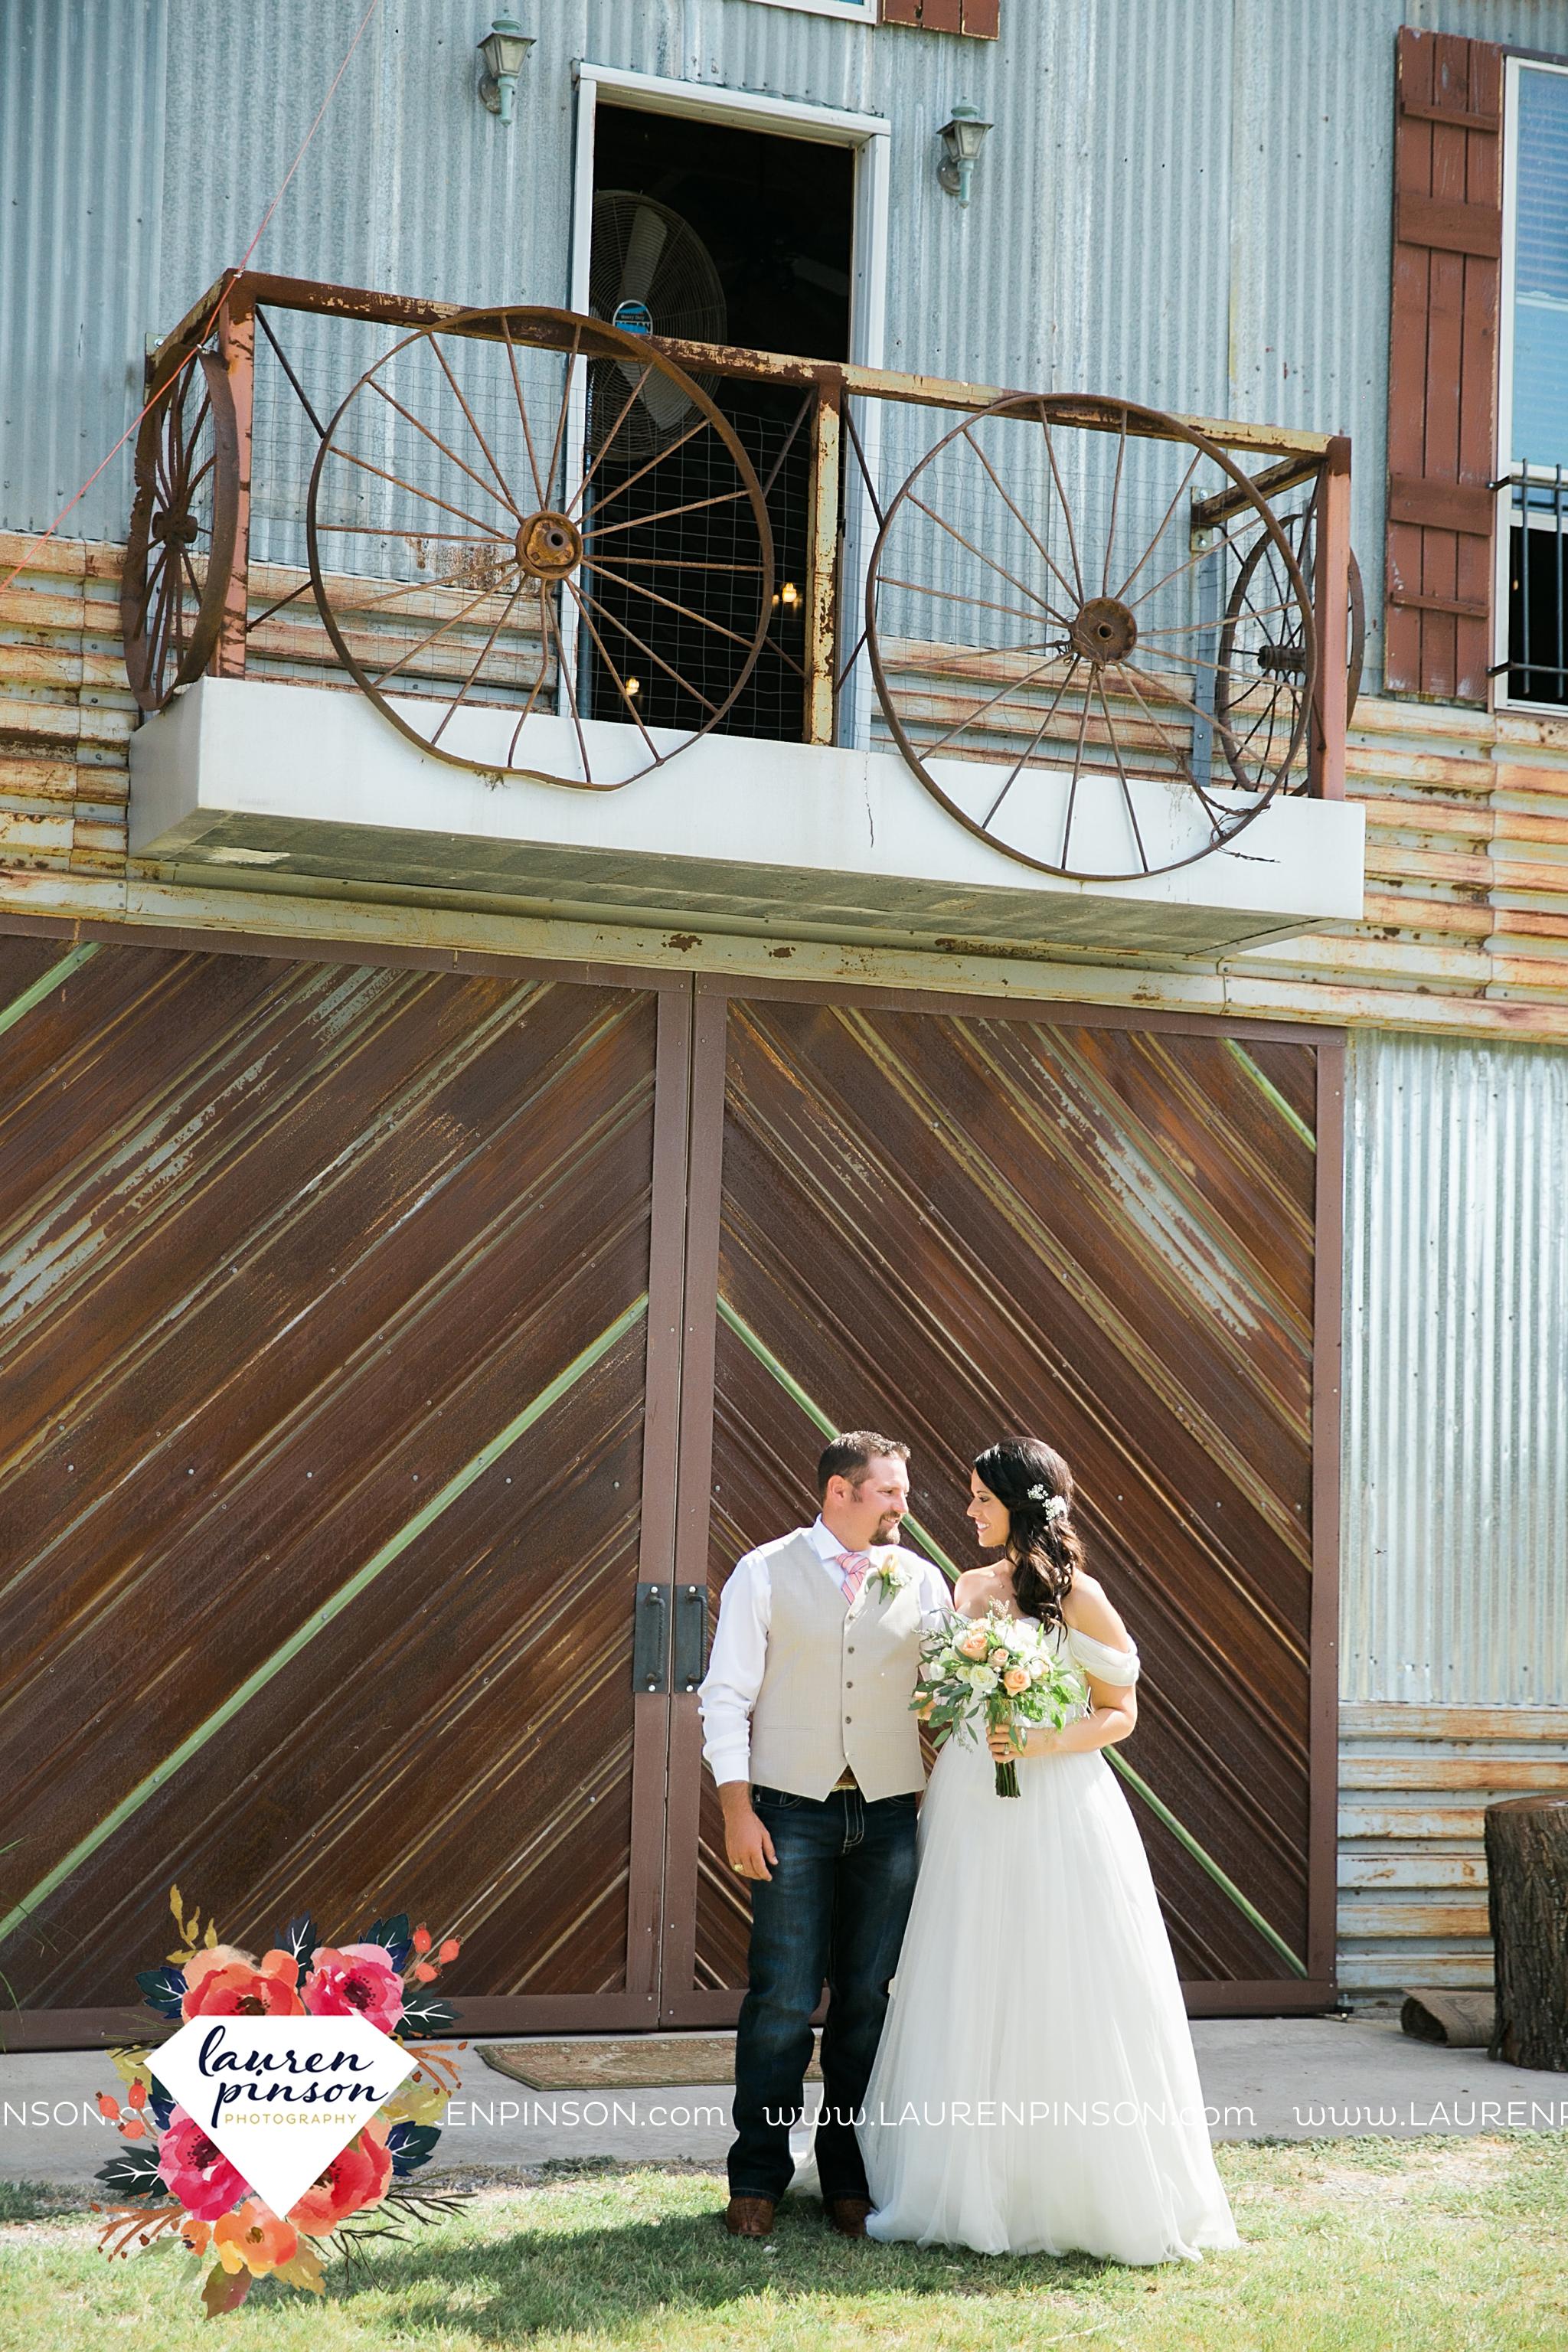 jones-barn-willow-creek-ranch-wedding-in-cleburne-texas-fort-worth-dfw-wichita-falls-wedding-photography_3206.jpg